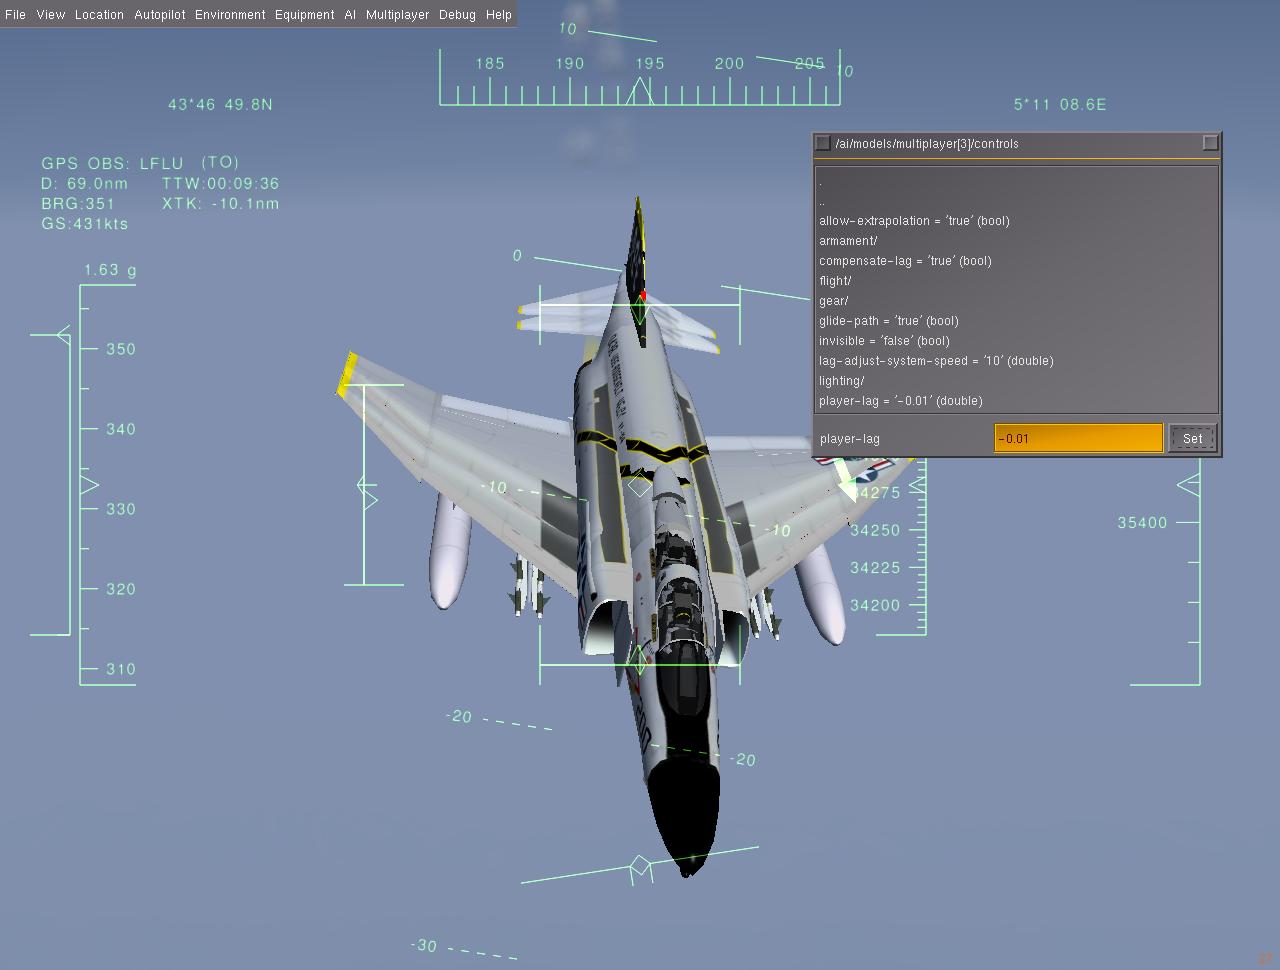 a propos de vol en formation F4n-compensated_lag